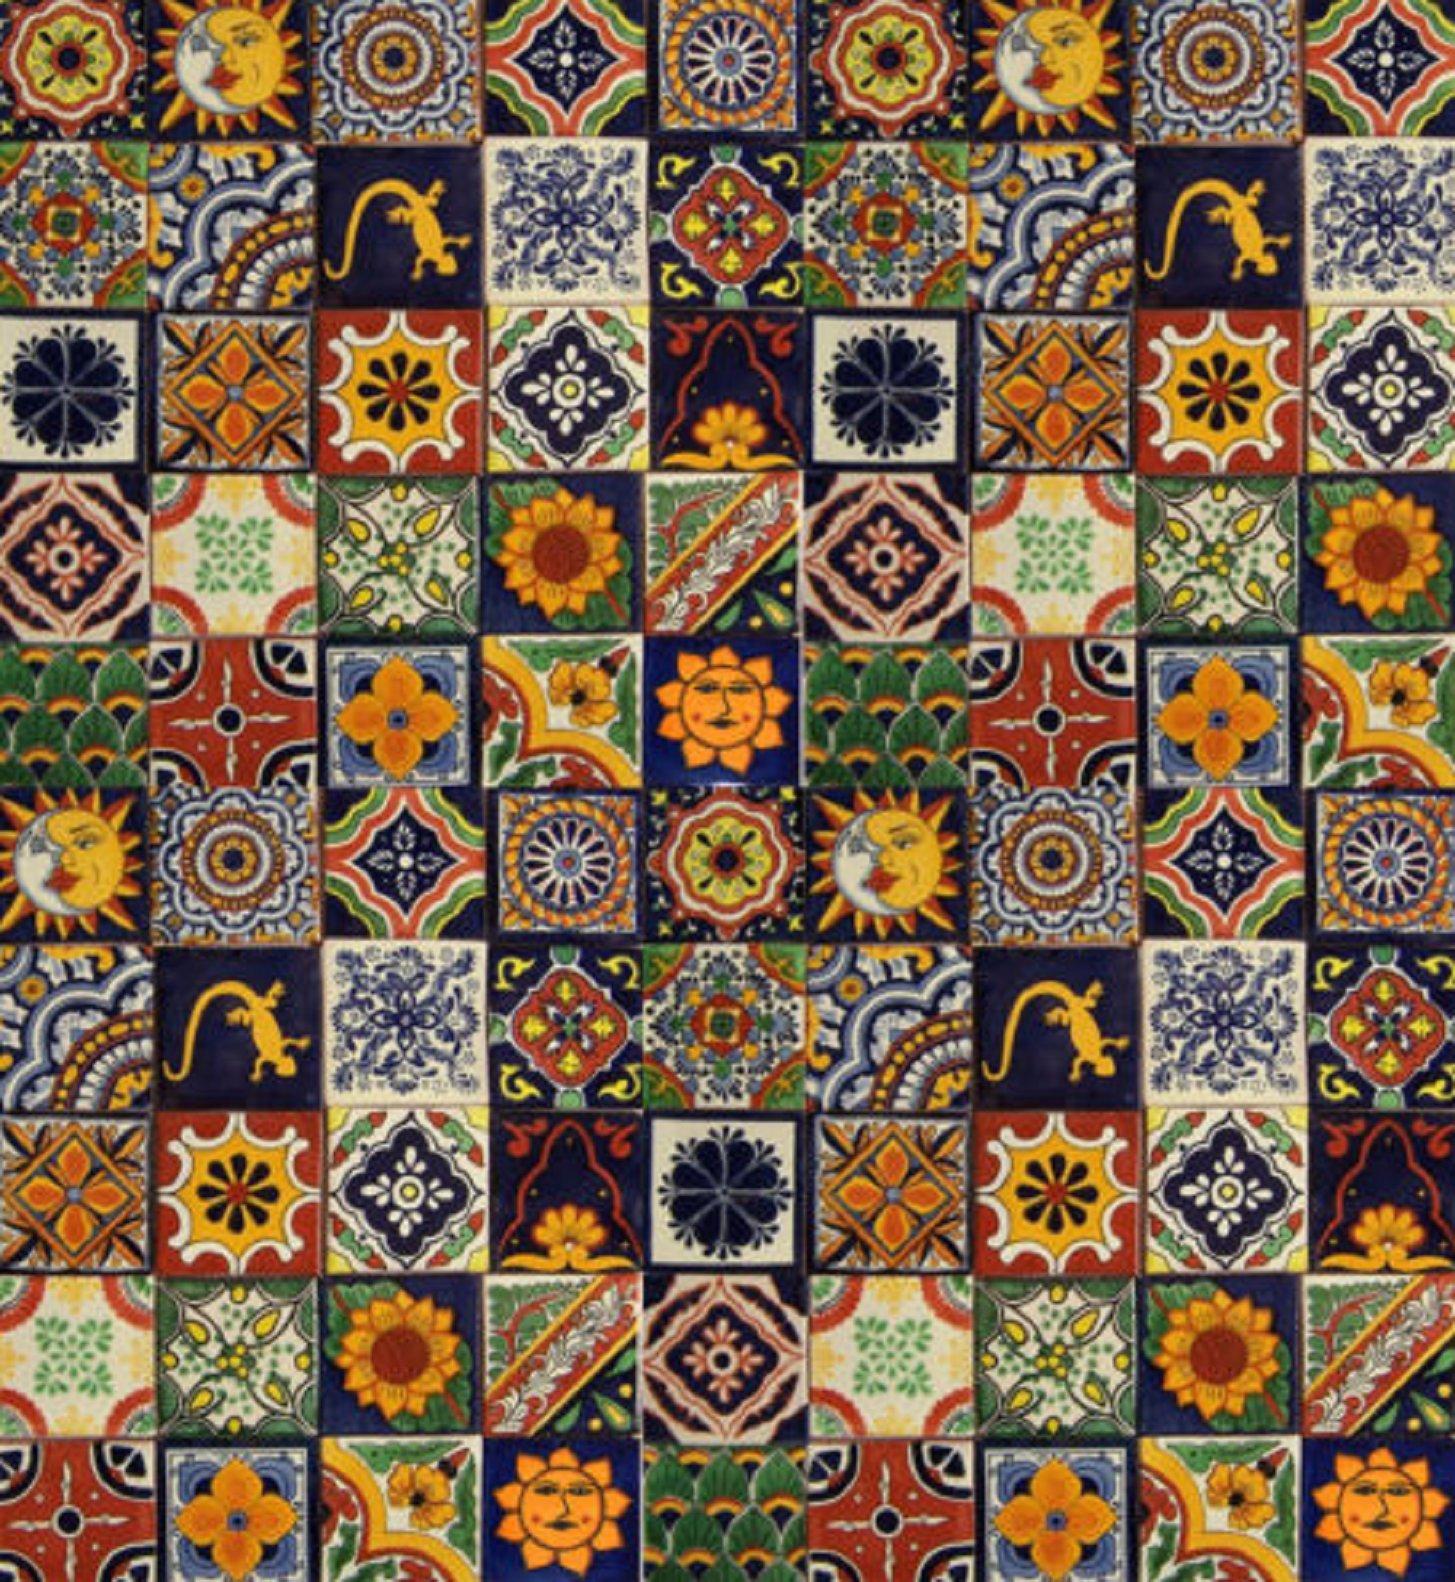 USA Premium Store 100 Mexican Talavera Ceramic Tiles 4'' MIXED by USA Premium Store